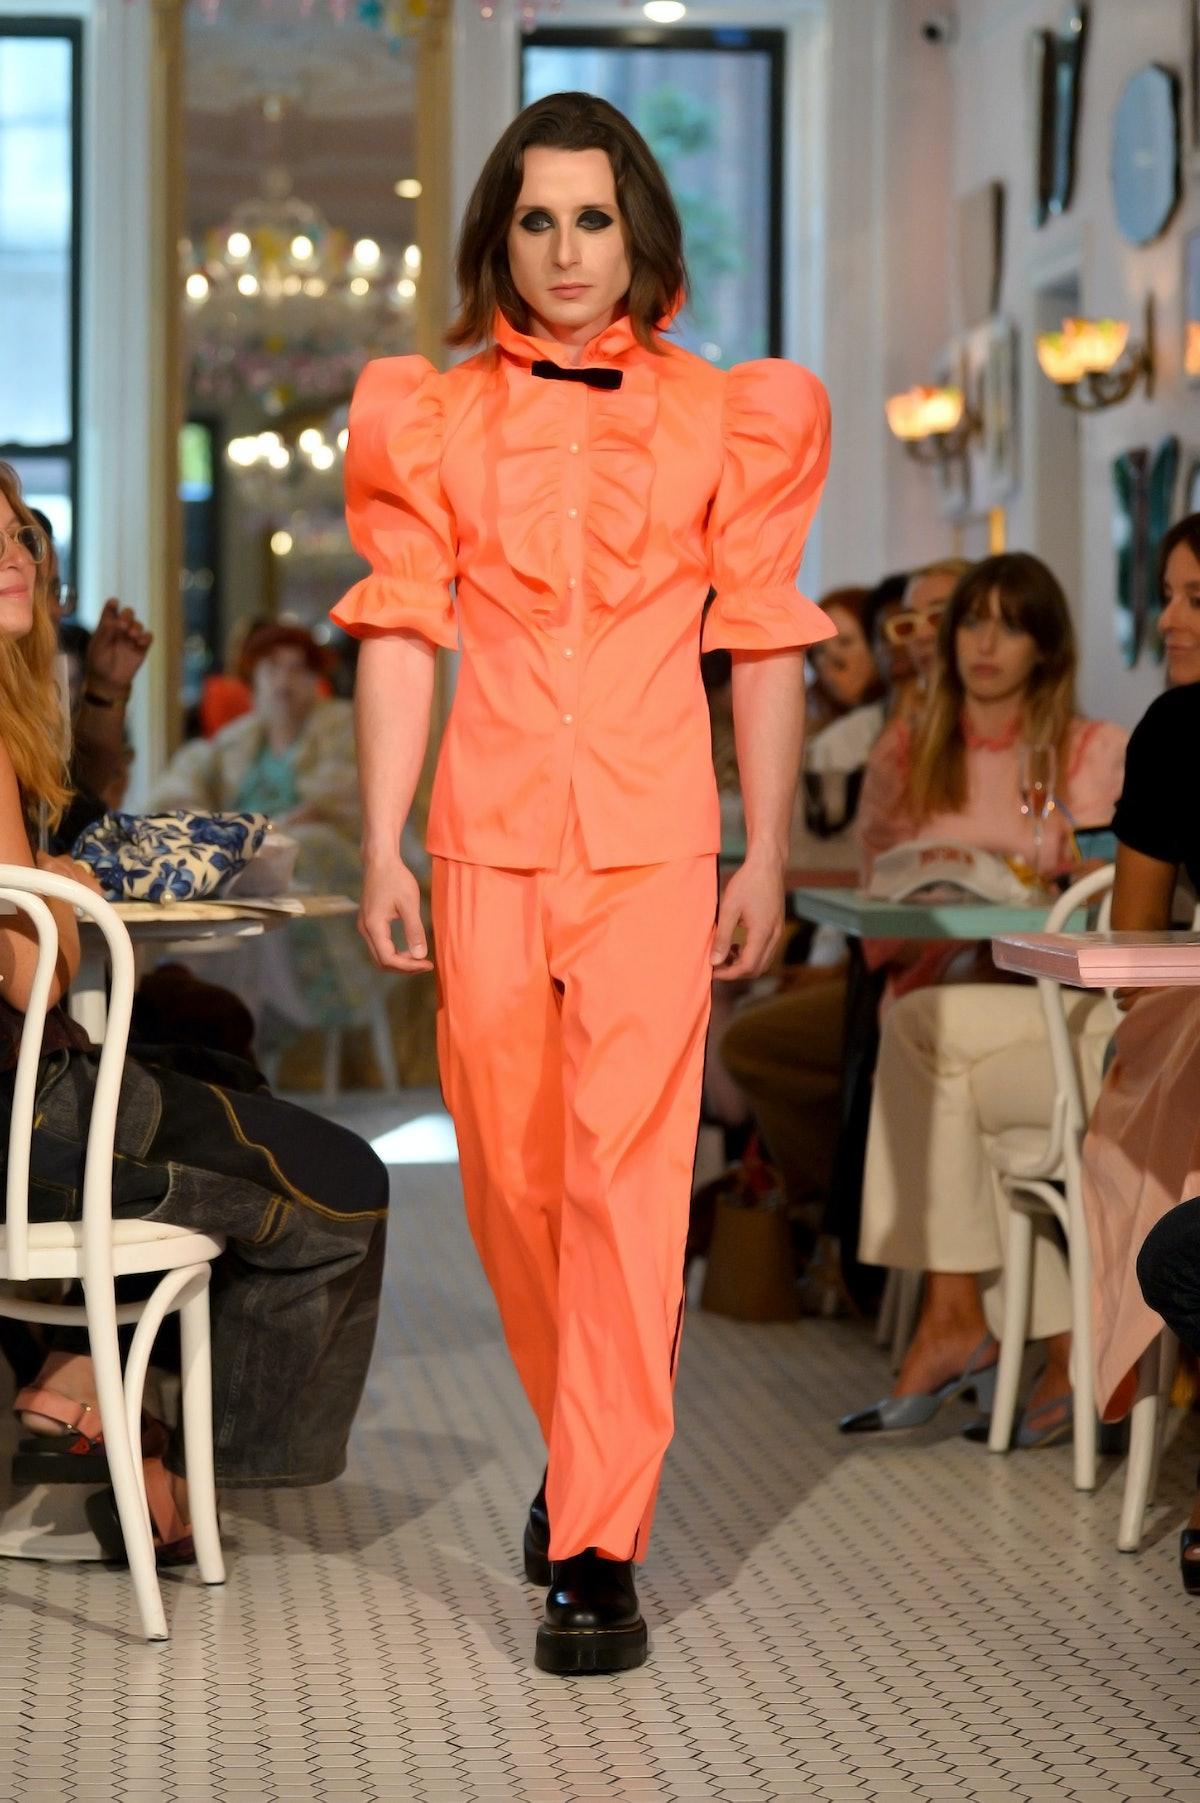 NEW YORK, NEW YORK - SEPTEMBER 10: A model walks the runway for Batsheva during NYFW: The Shows on S...